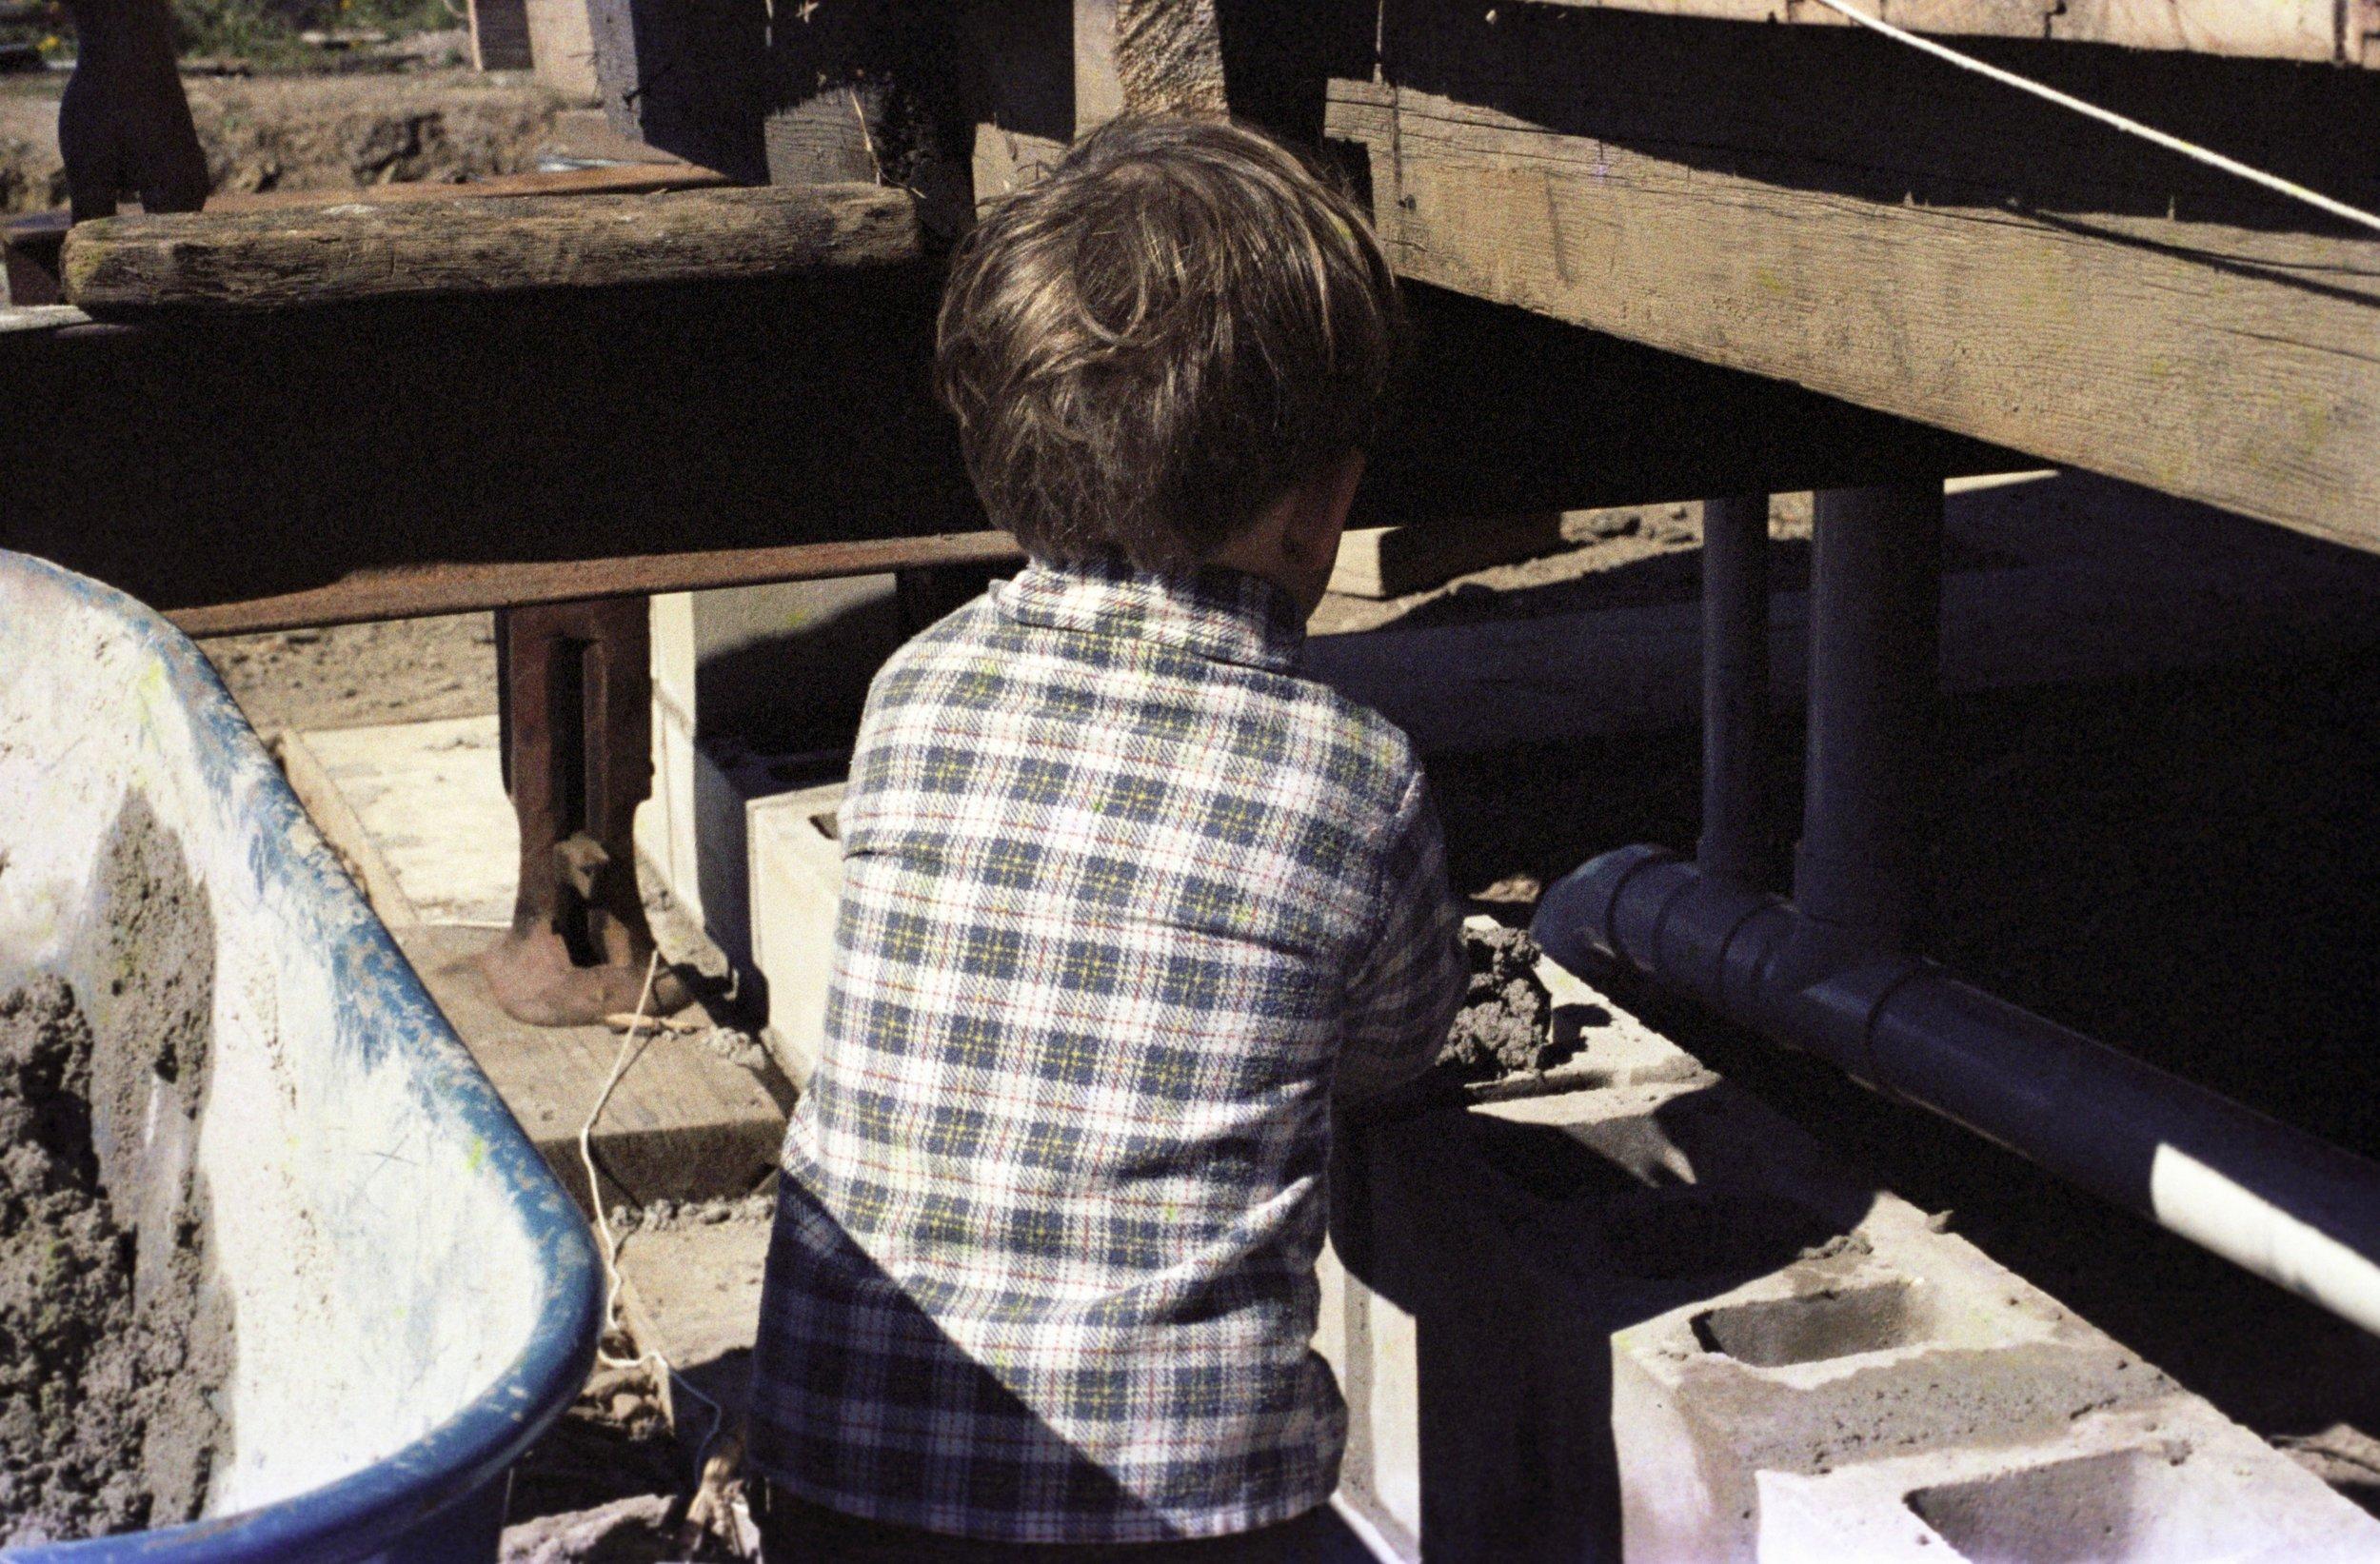 1978_Bird_Sanctuary_Tom_Laying_Cement_Helping_Tractor_Trucks_016.jpg